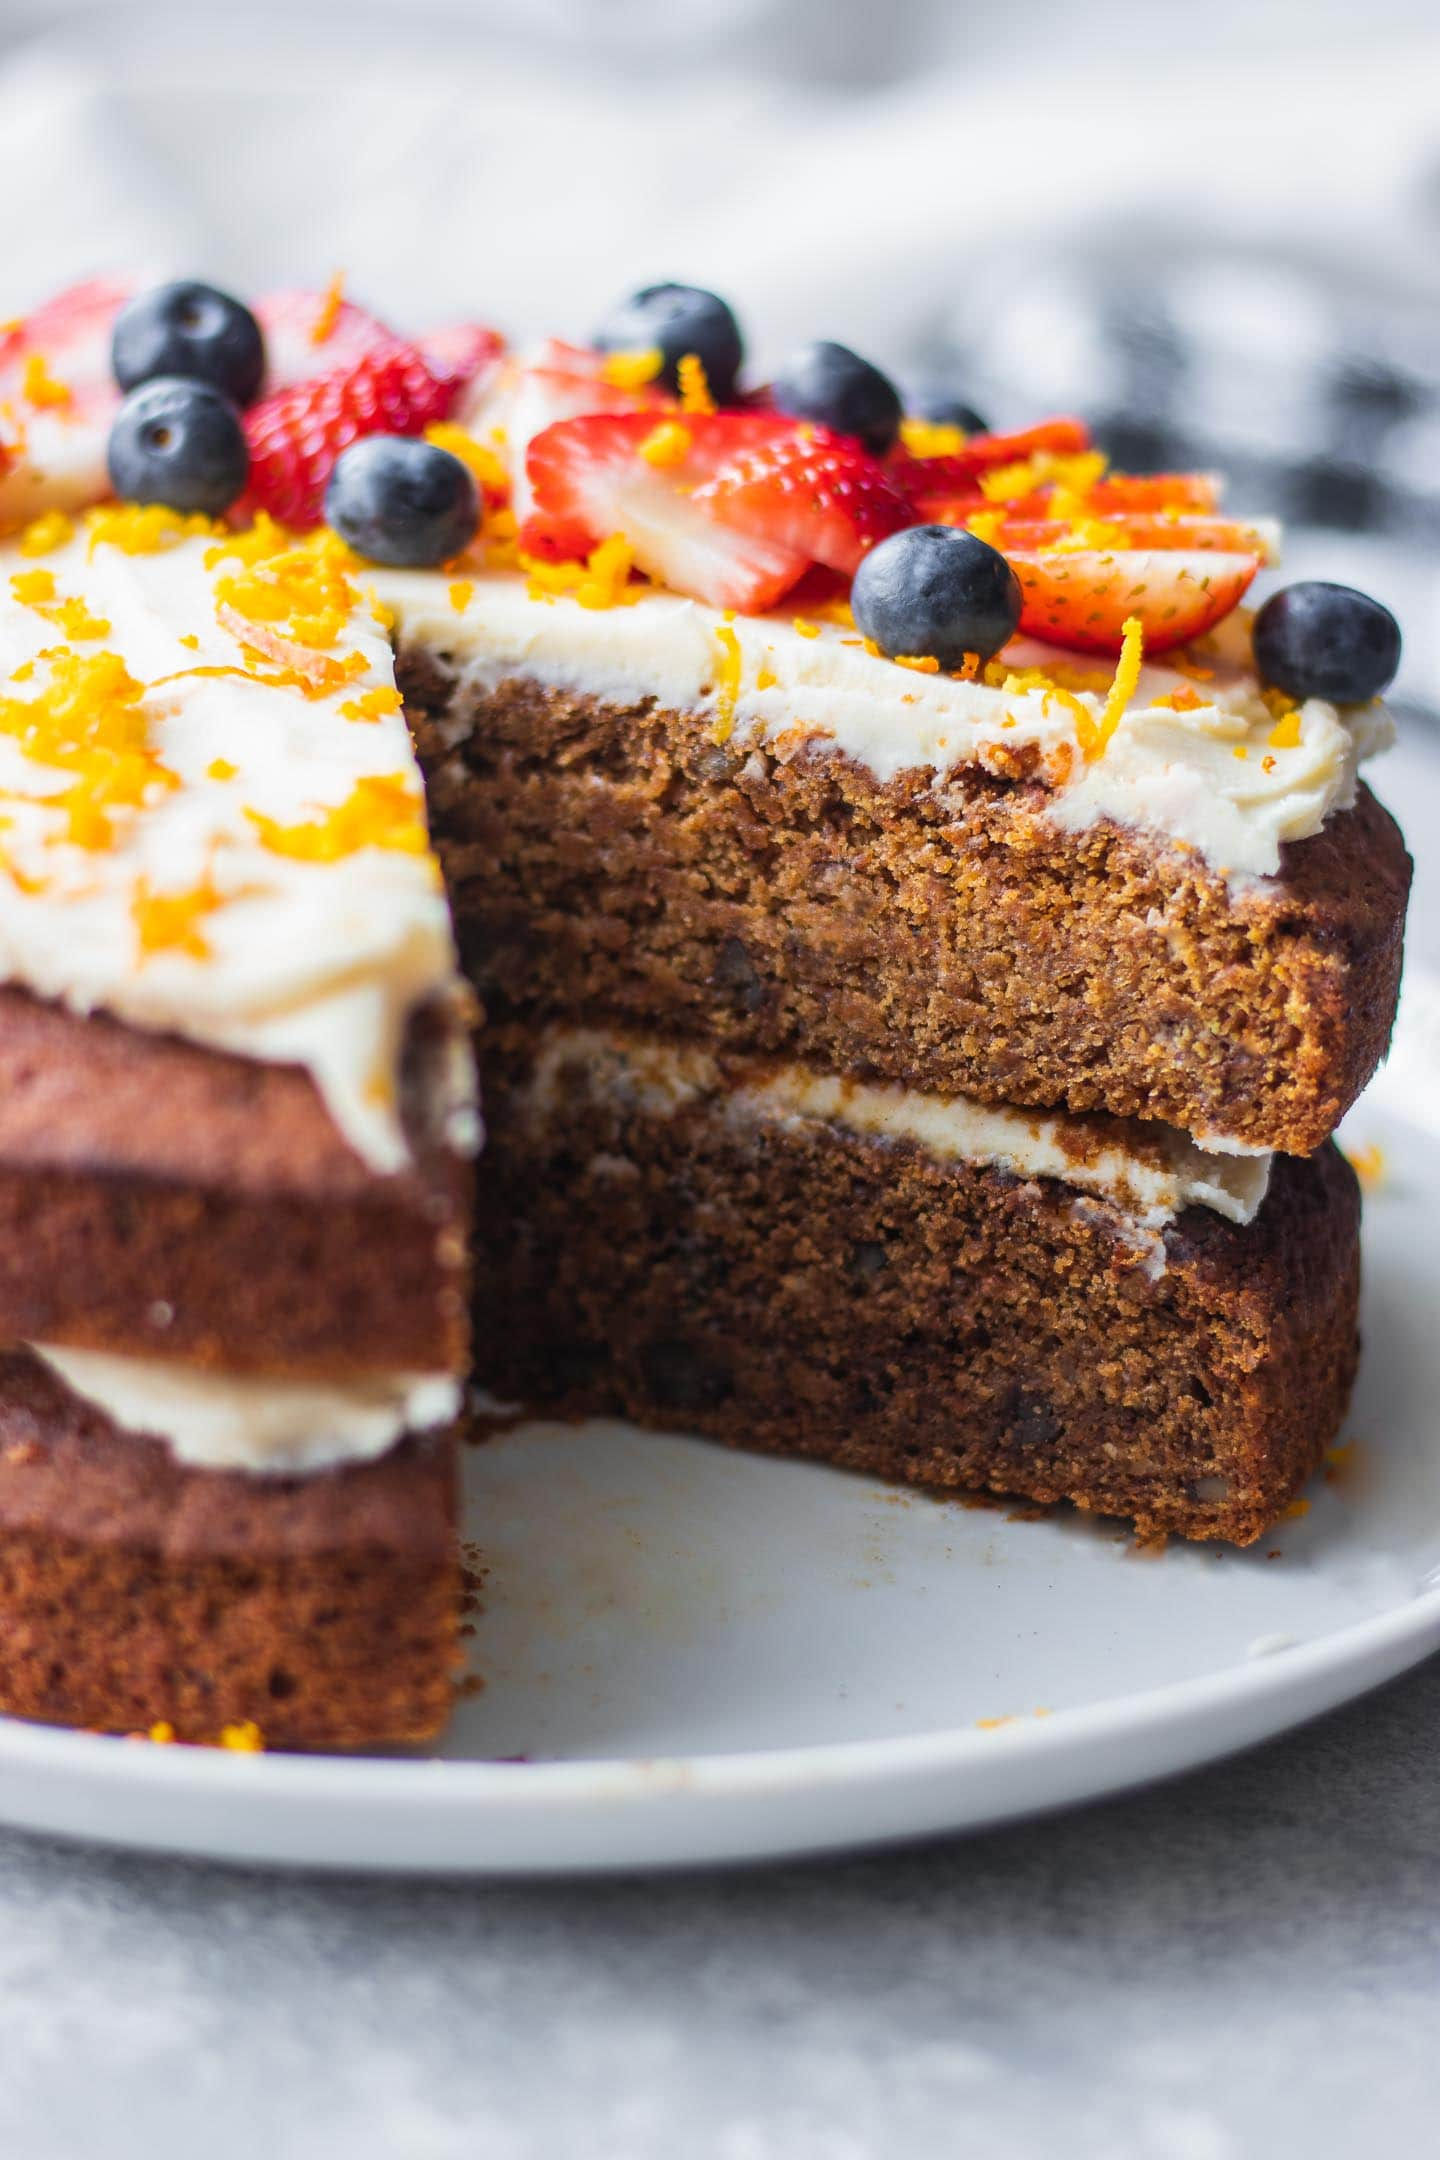 Vegan carrot cake on a white plate